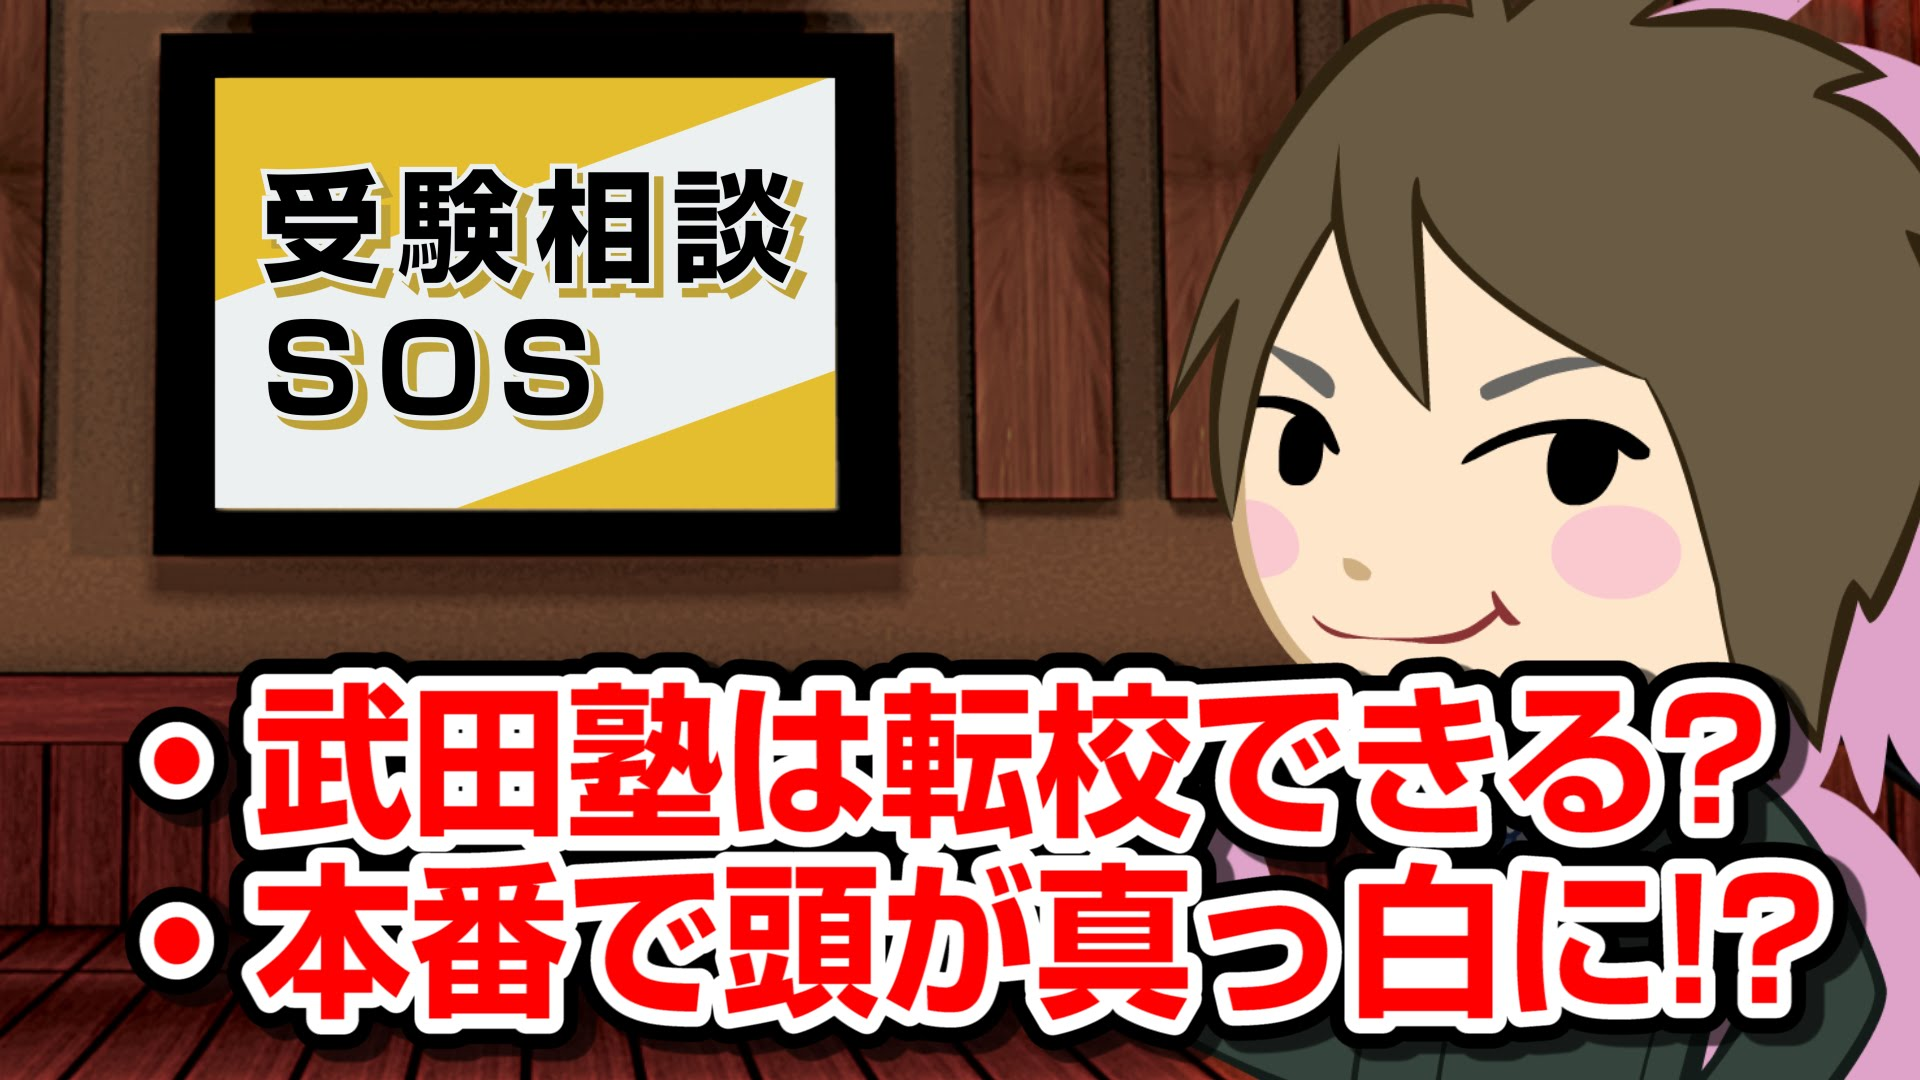 【vol.87】武田塾は転校できるの?本番で頭が真っ白になった時の対処法|受験相談SOS